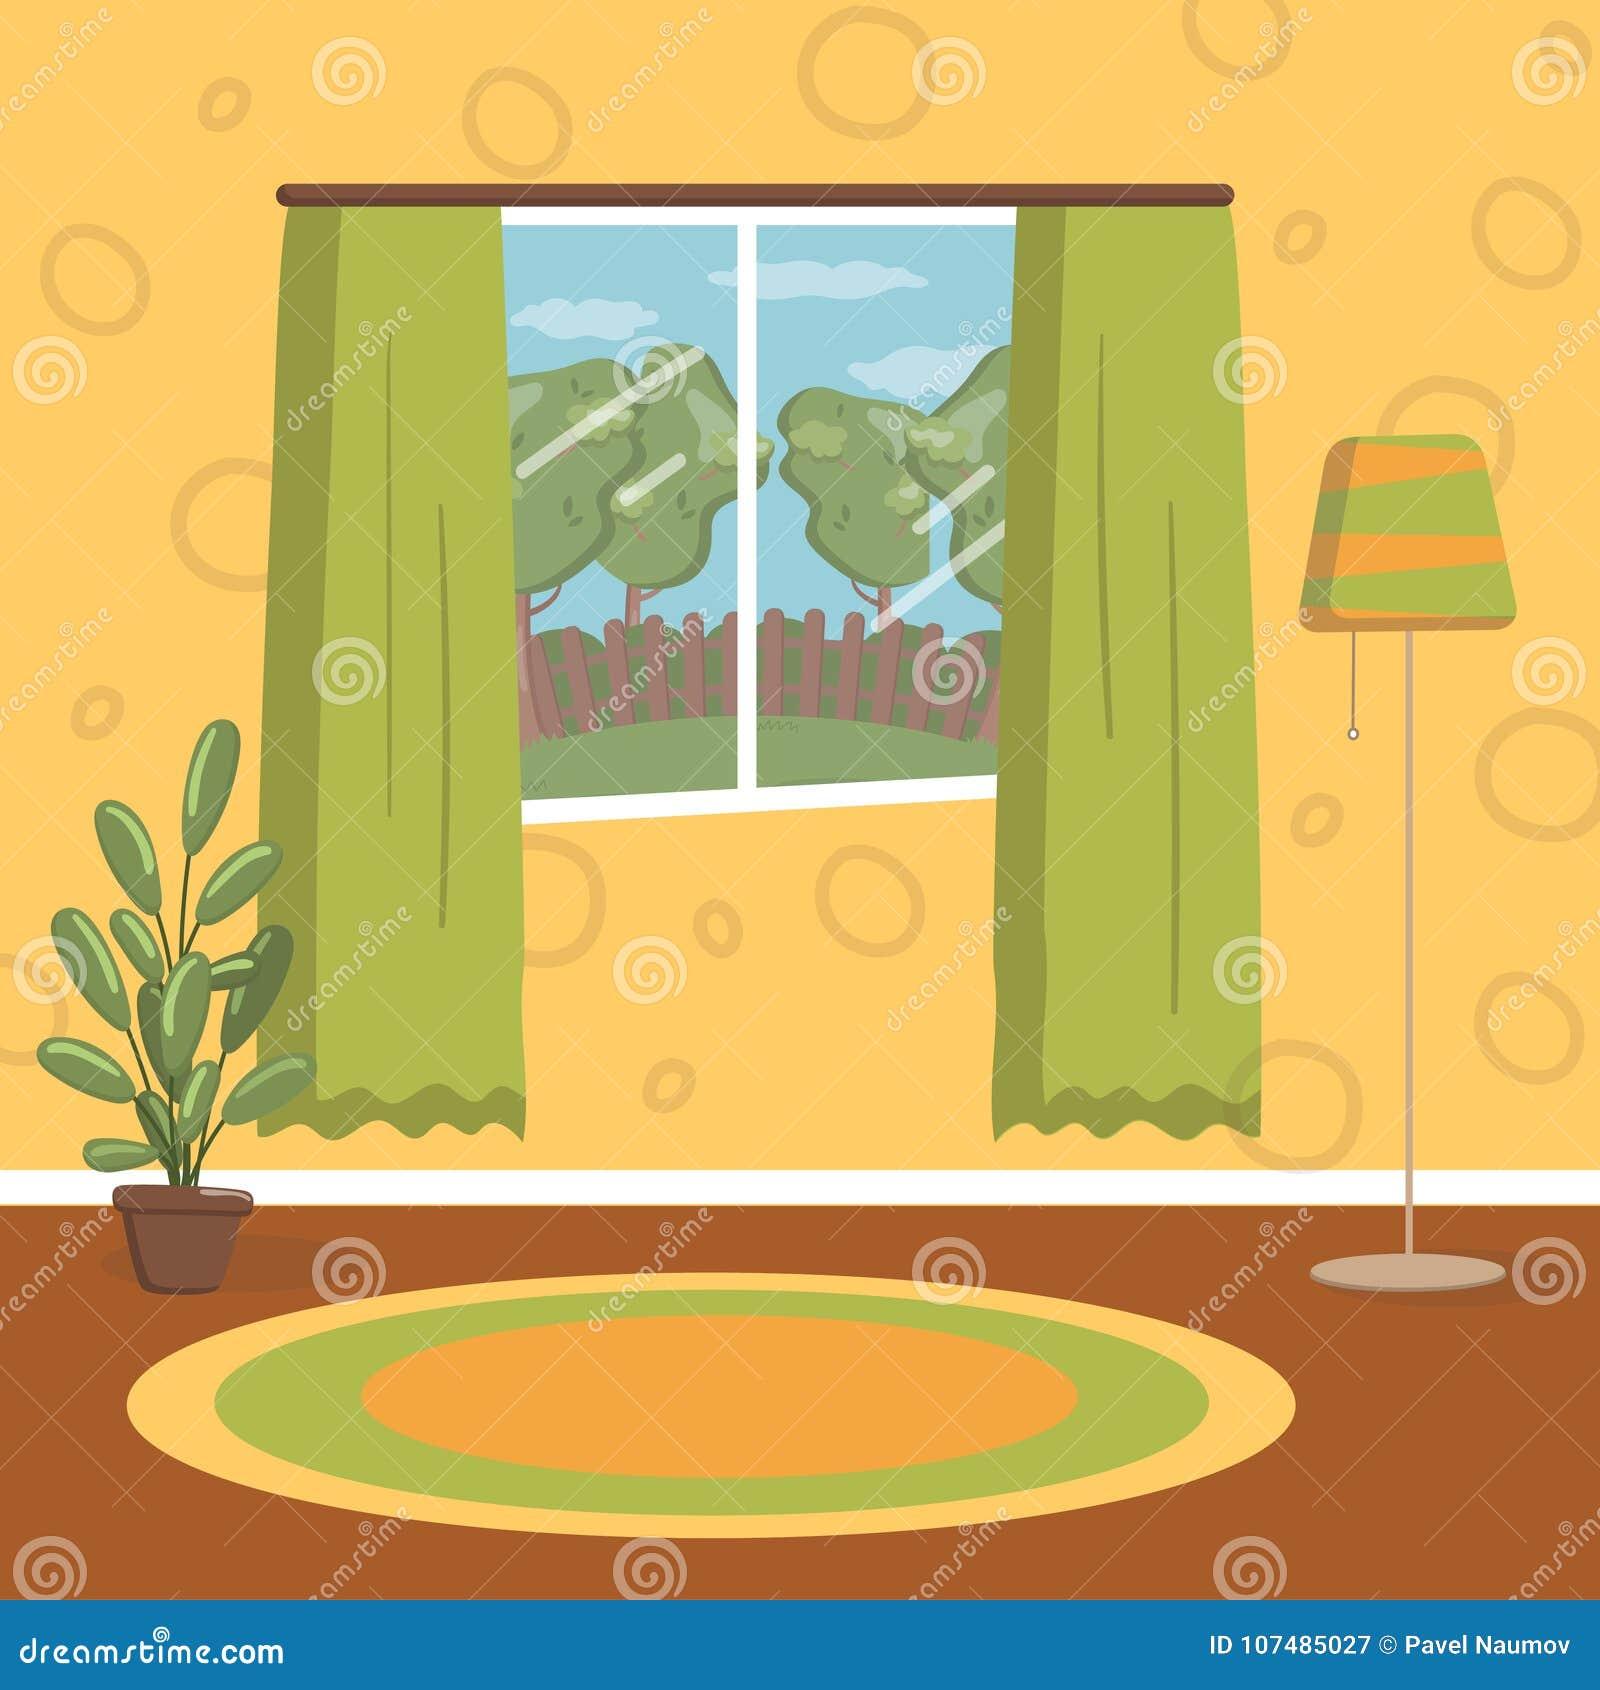 Groovy Retro Living Room Vintage Cozy Home Interior Vector Download Free Architecture Designs Fluibritishbridgeorg